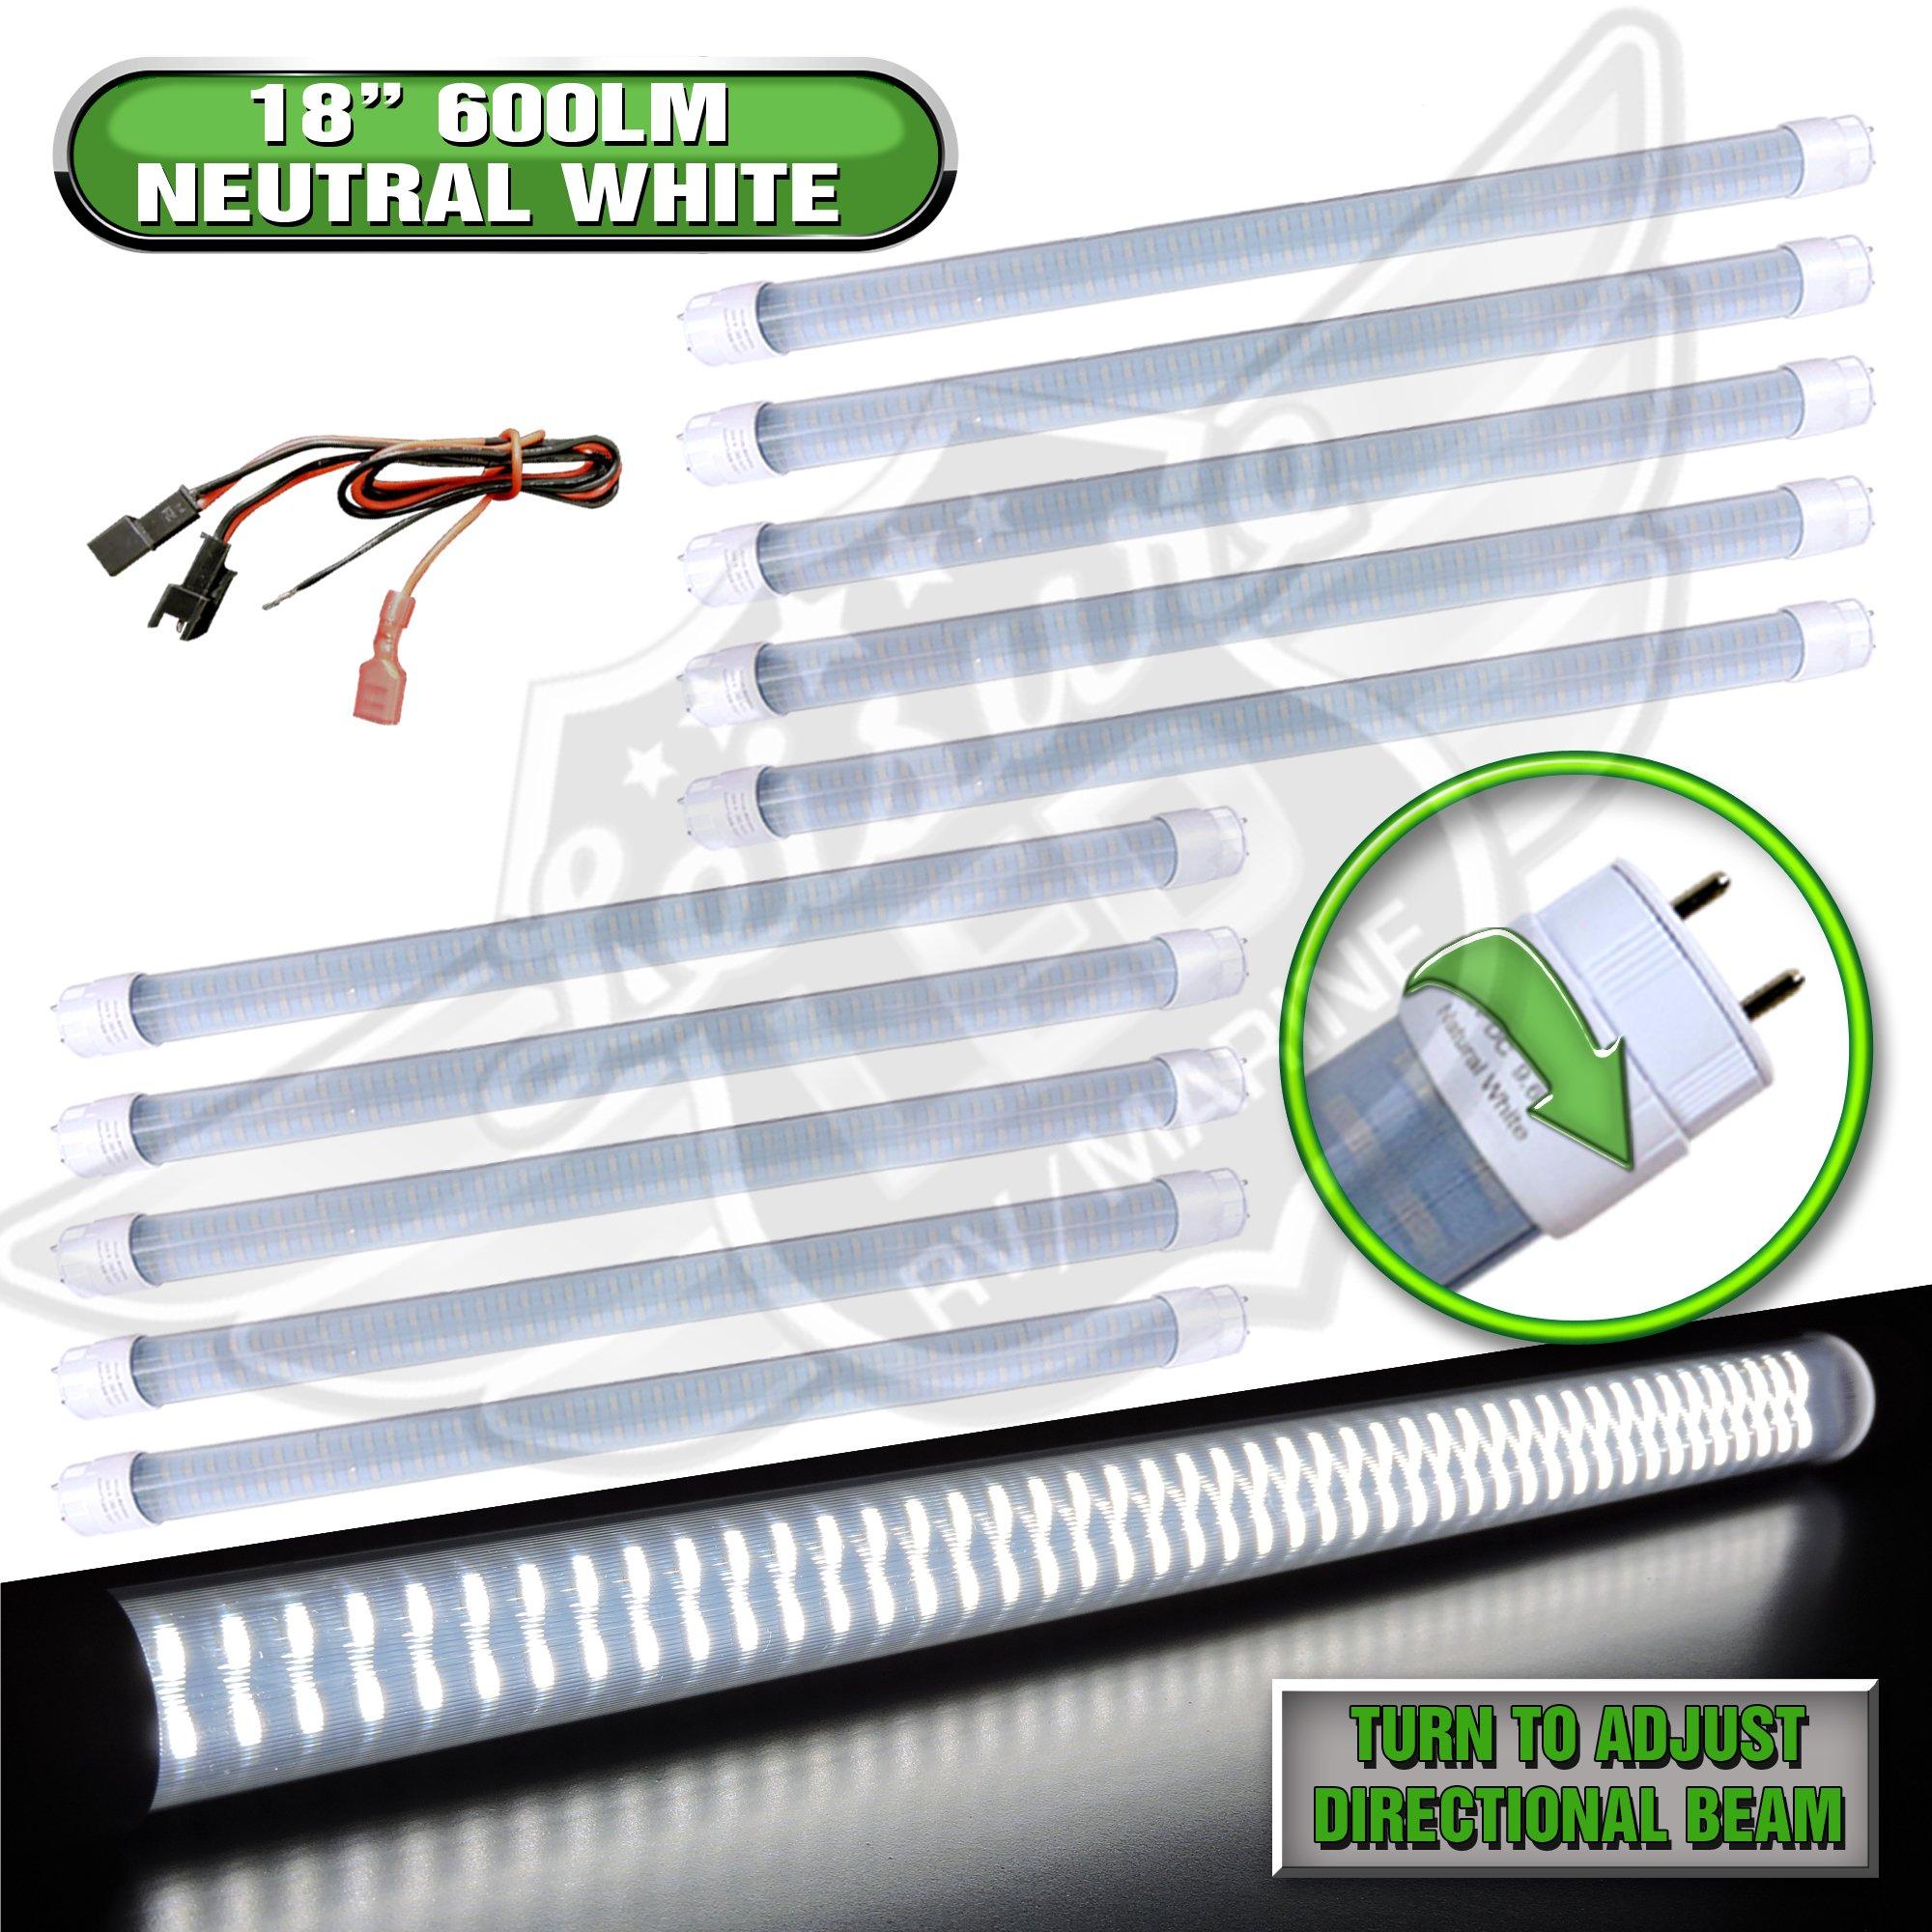 RV Light Bulb LED T8, 18'' Florescent Tube Replacement, 600 Lumen (Natural White) (10)